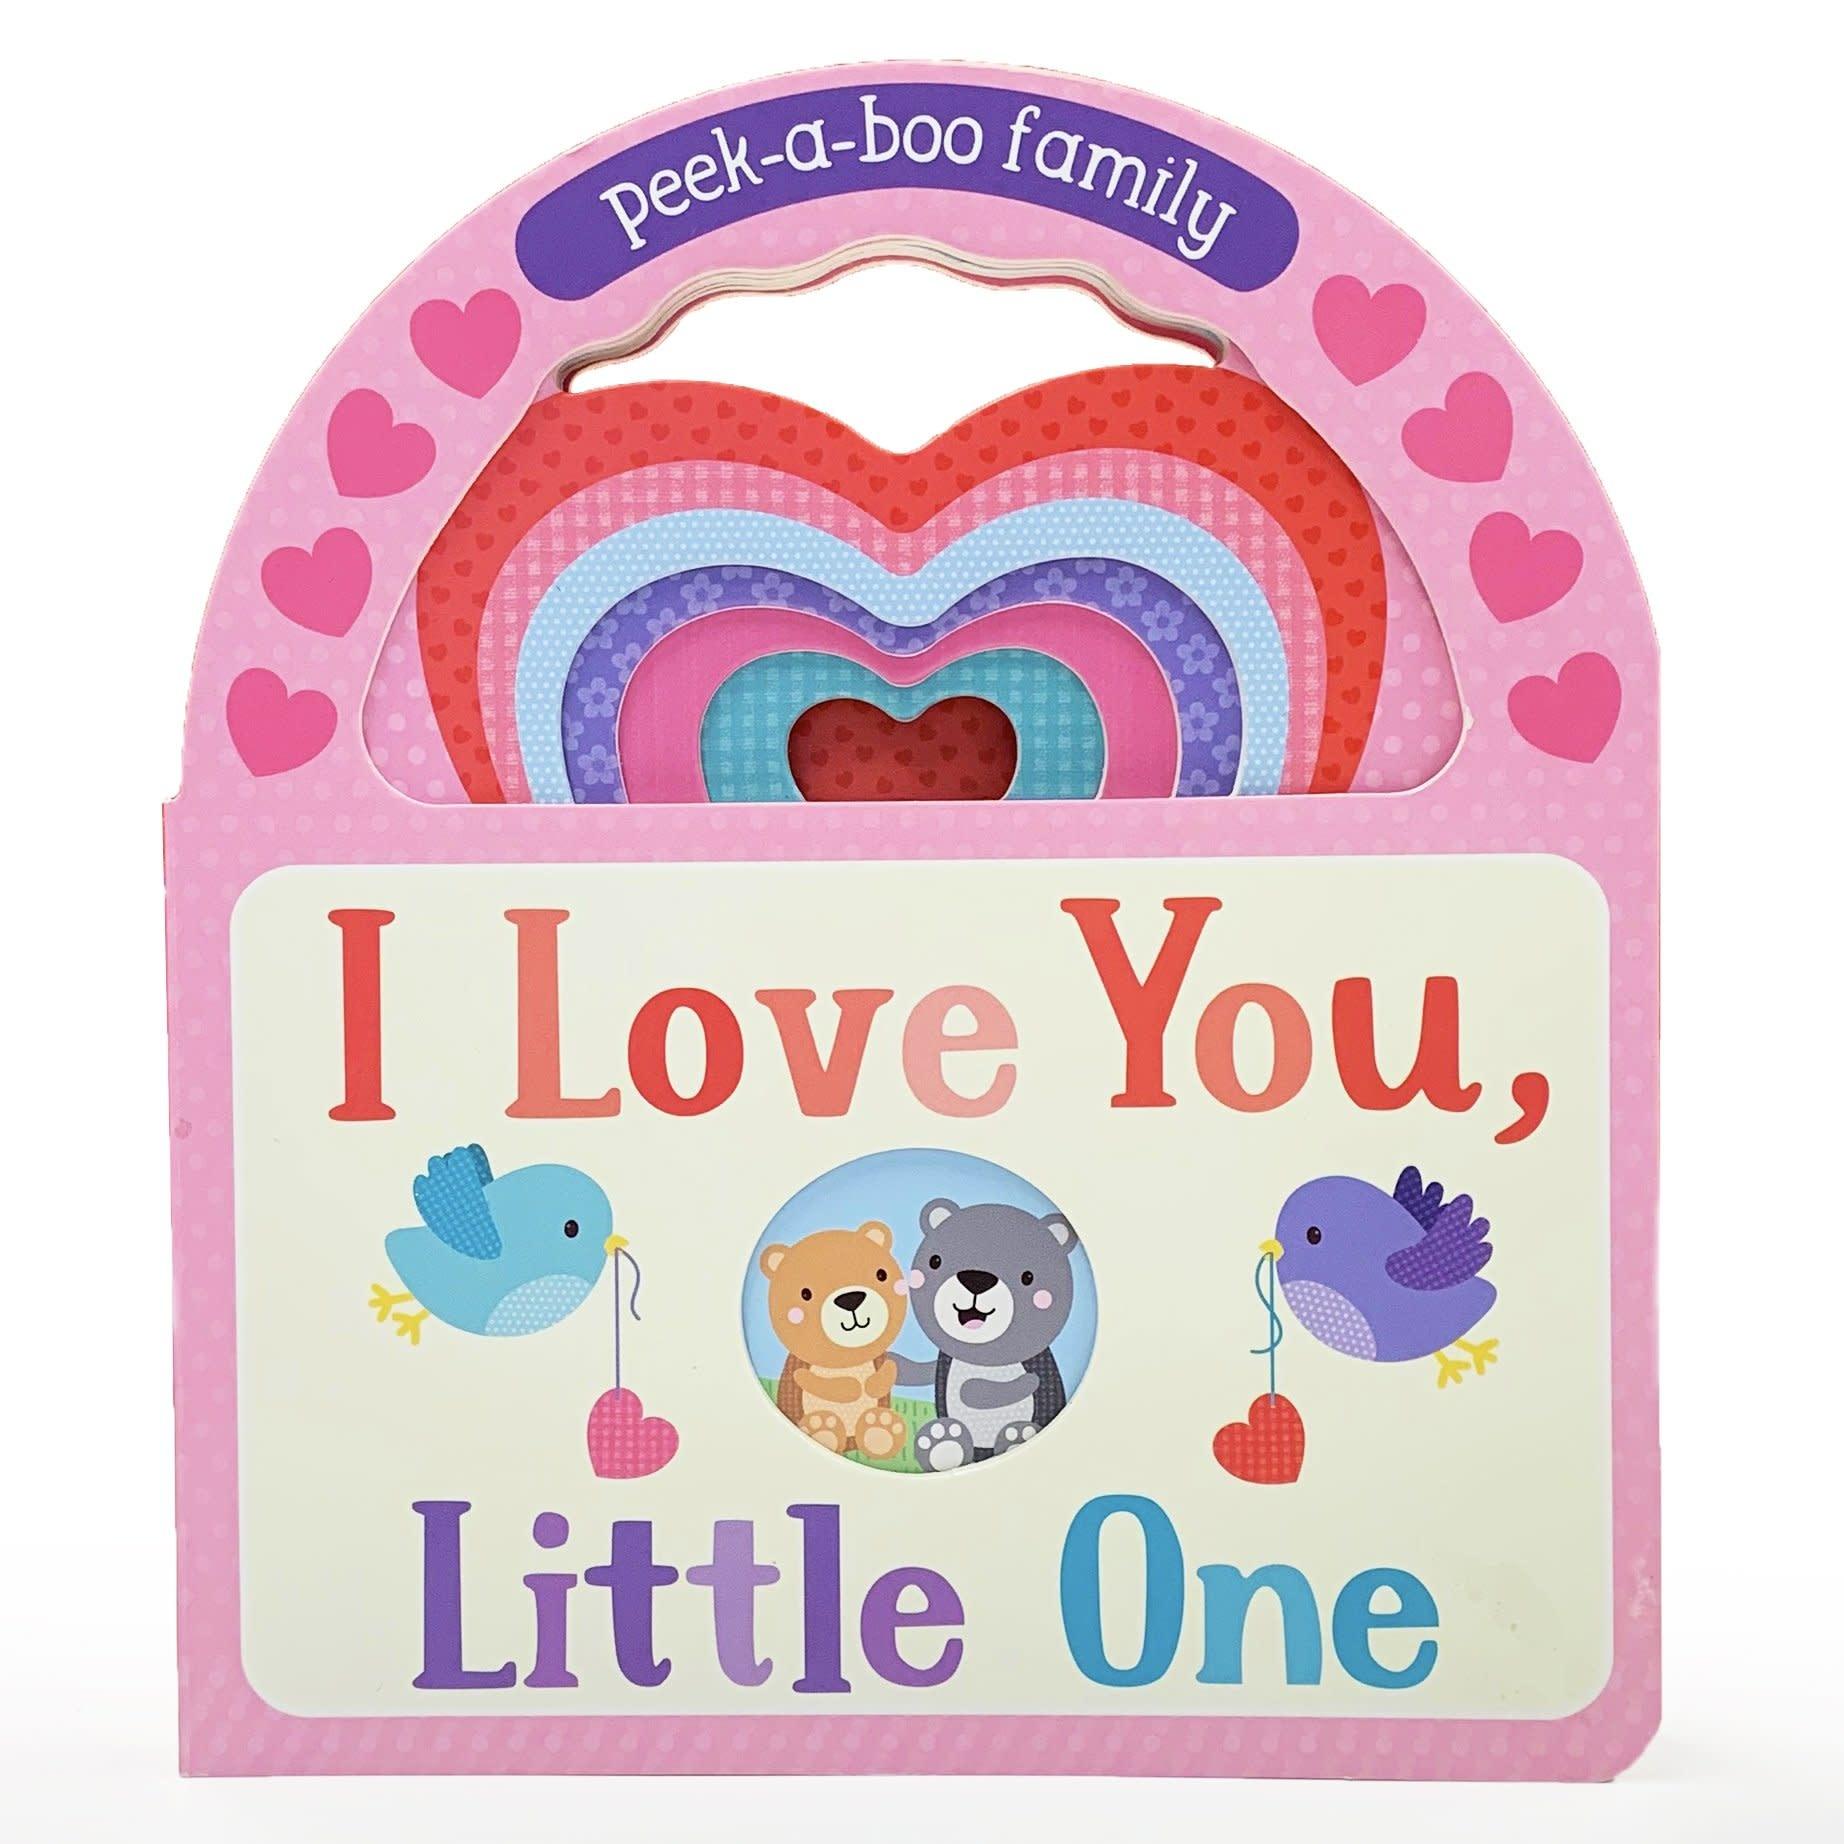 Cottage Door Press I Love You, Little One